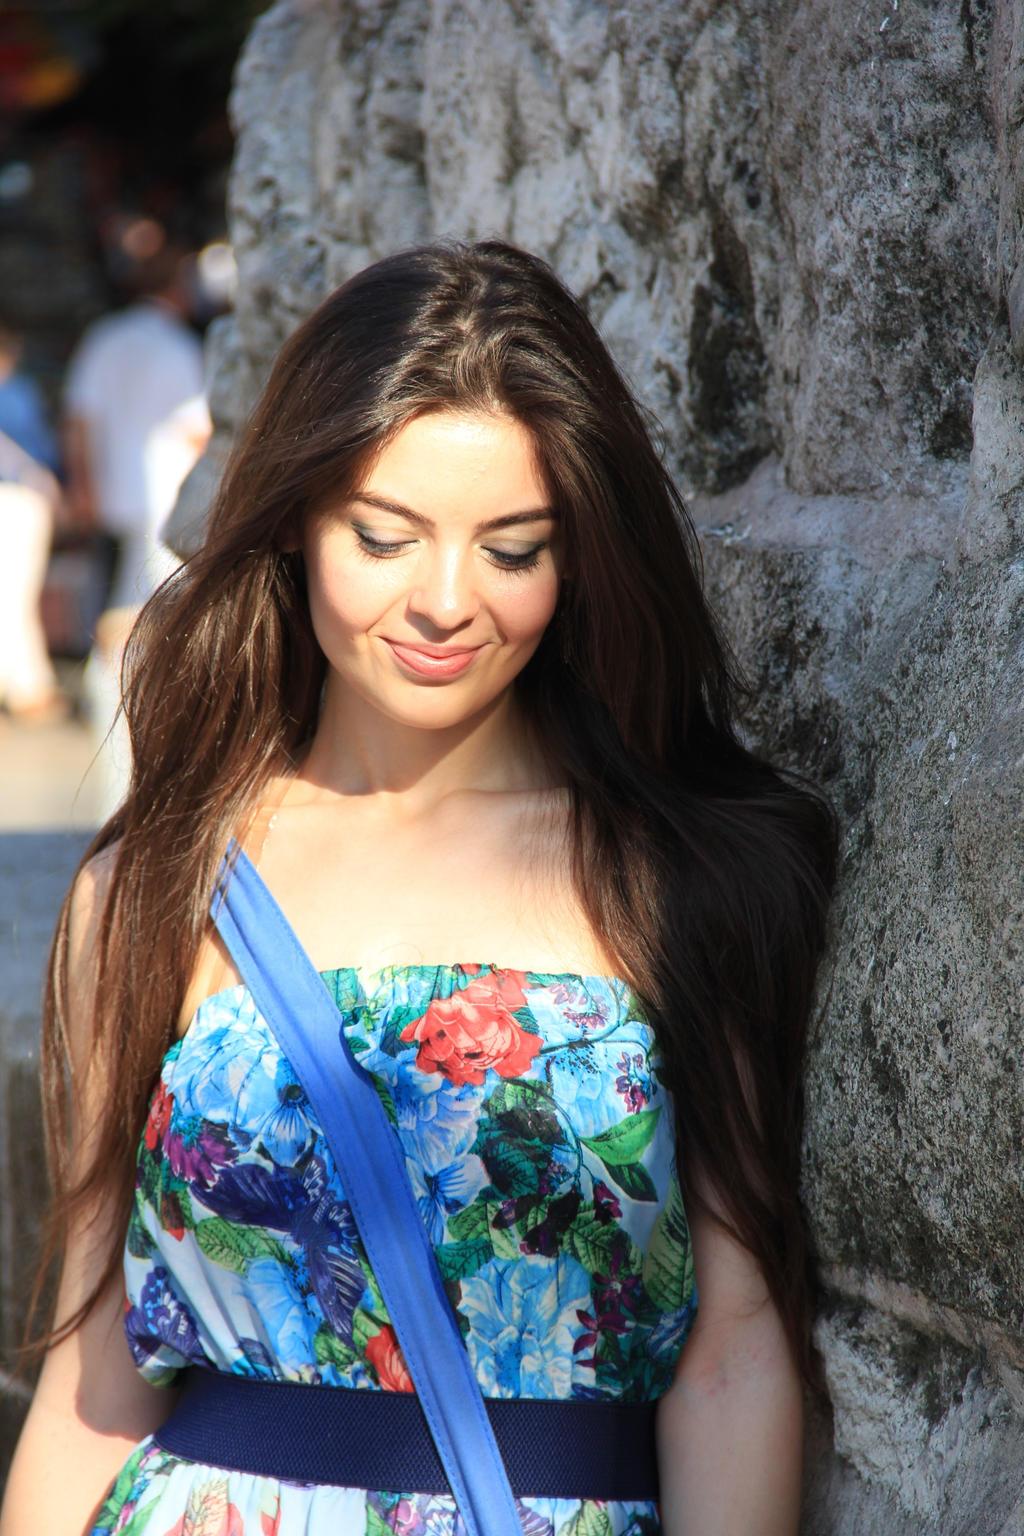 yiimisekiz's Profile Picture